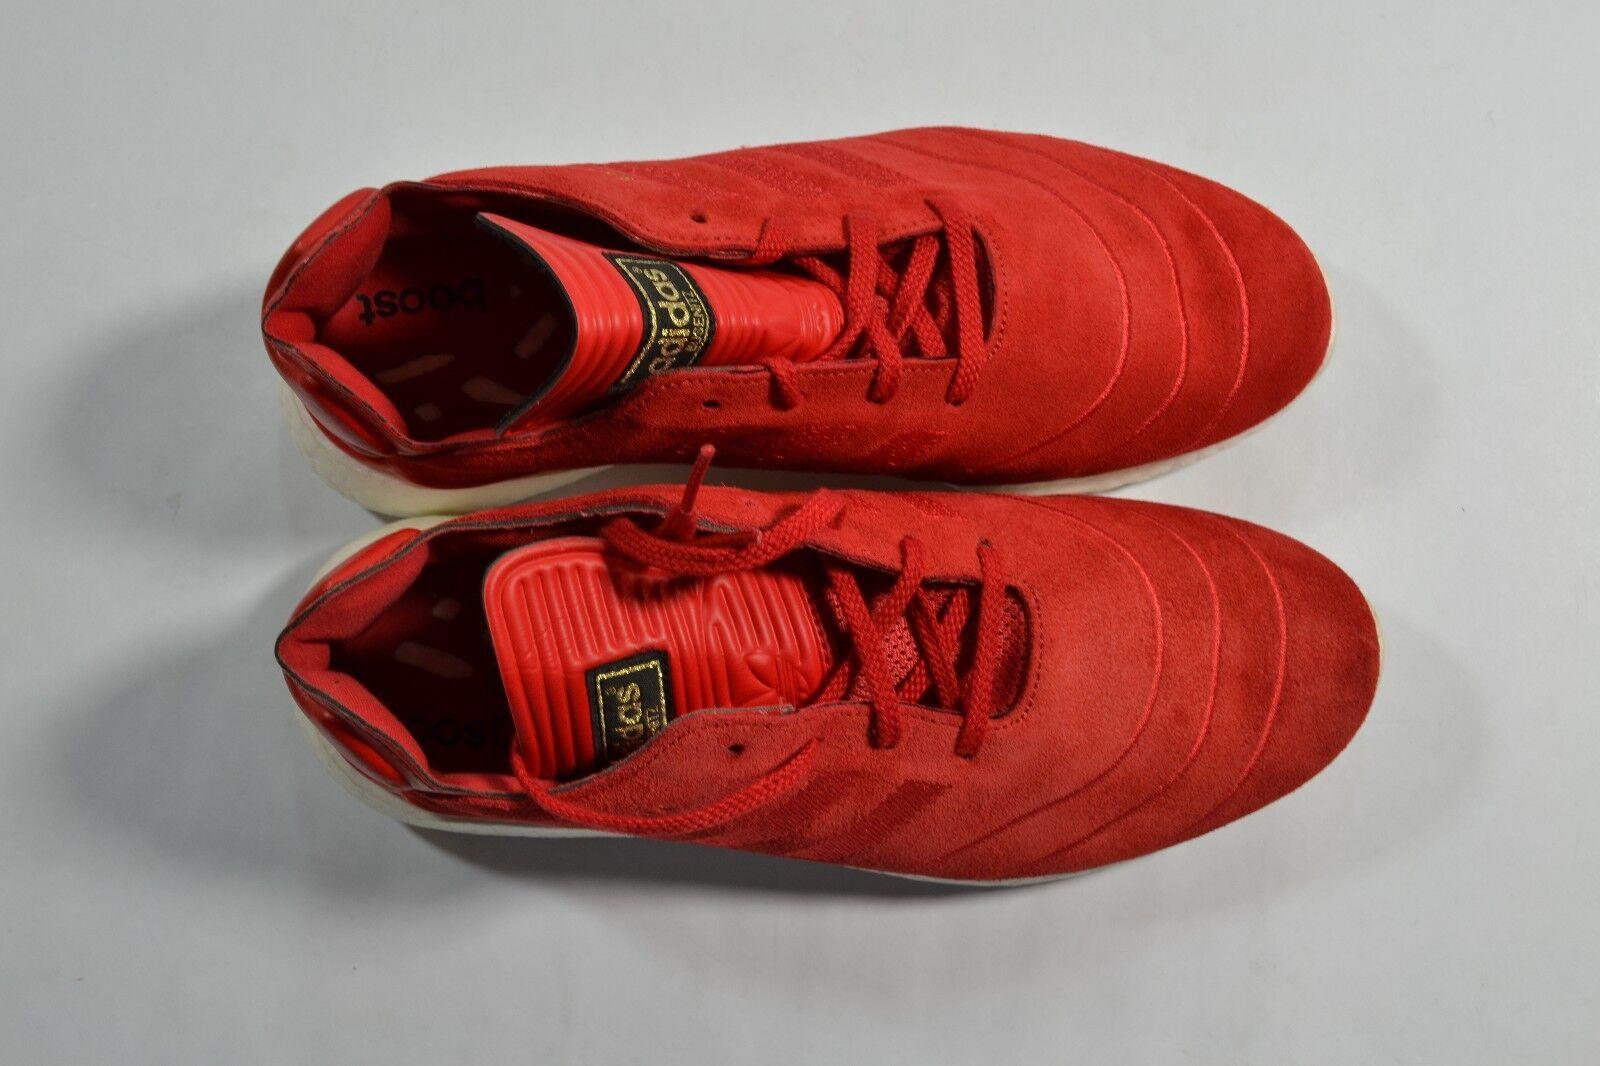 Adidas busenitz puro slancio scarlet rosso - bianco) (351), (351), (351), scarpe da uomo 61475e